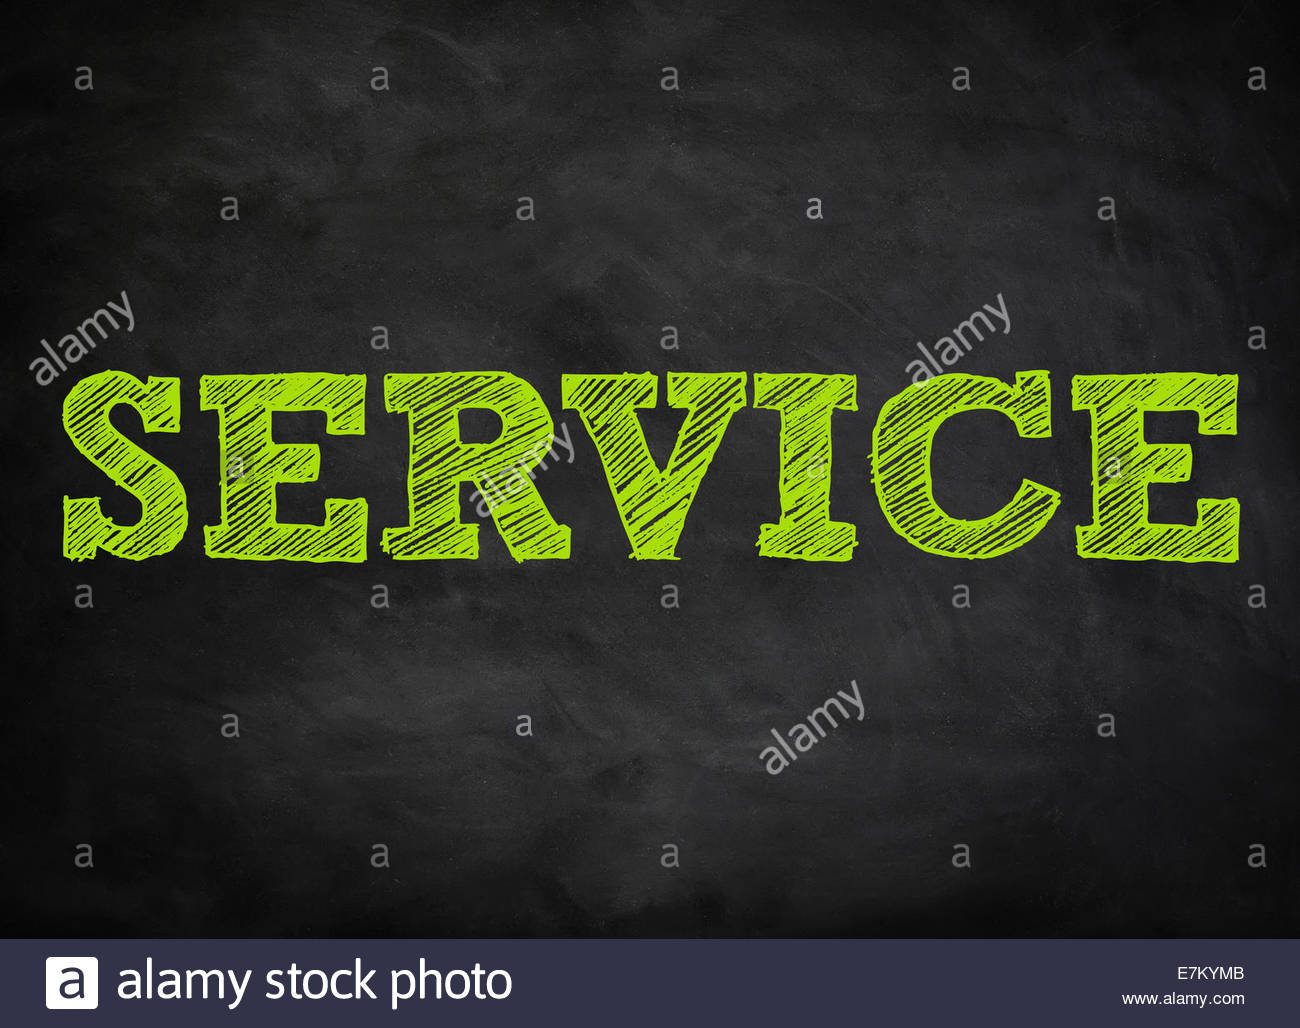 SERVICE - chalkboard concept - Stock Image